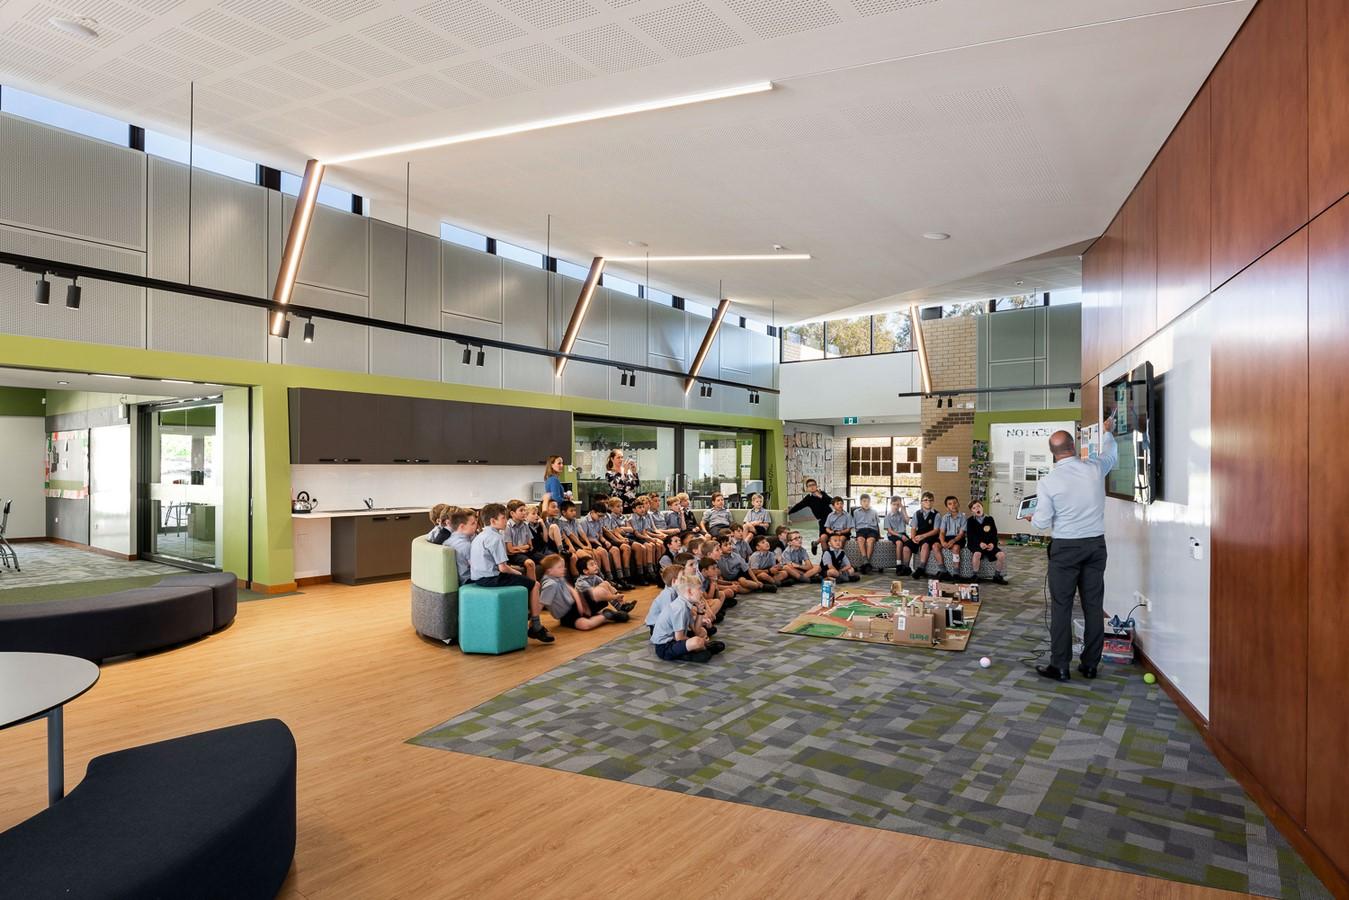 Hale Junior School, Wembley Downs - Sheet1